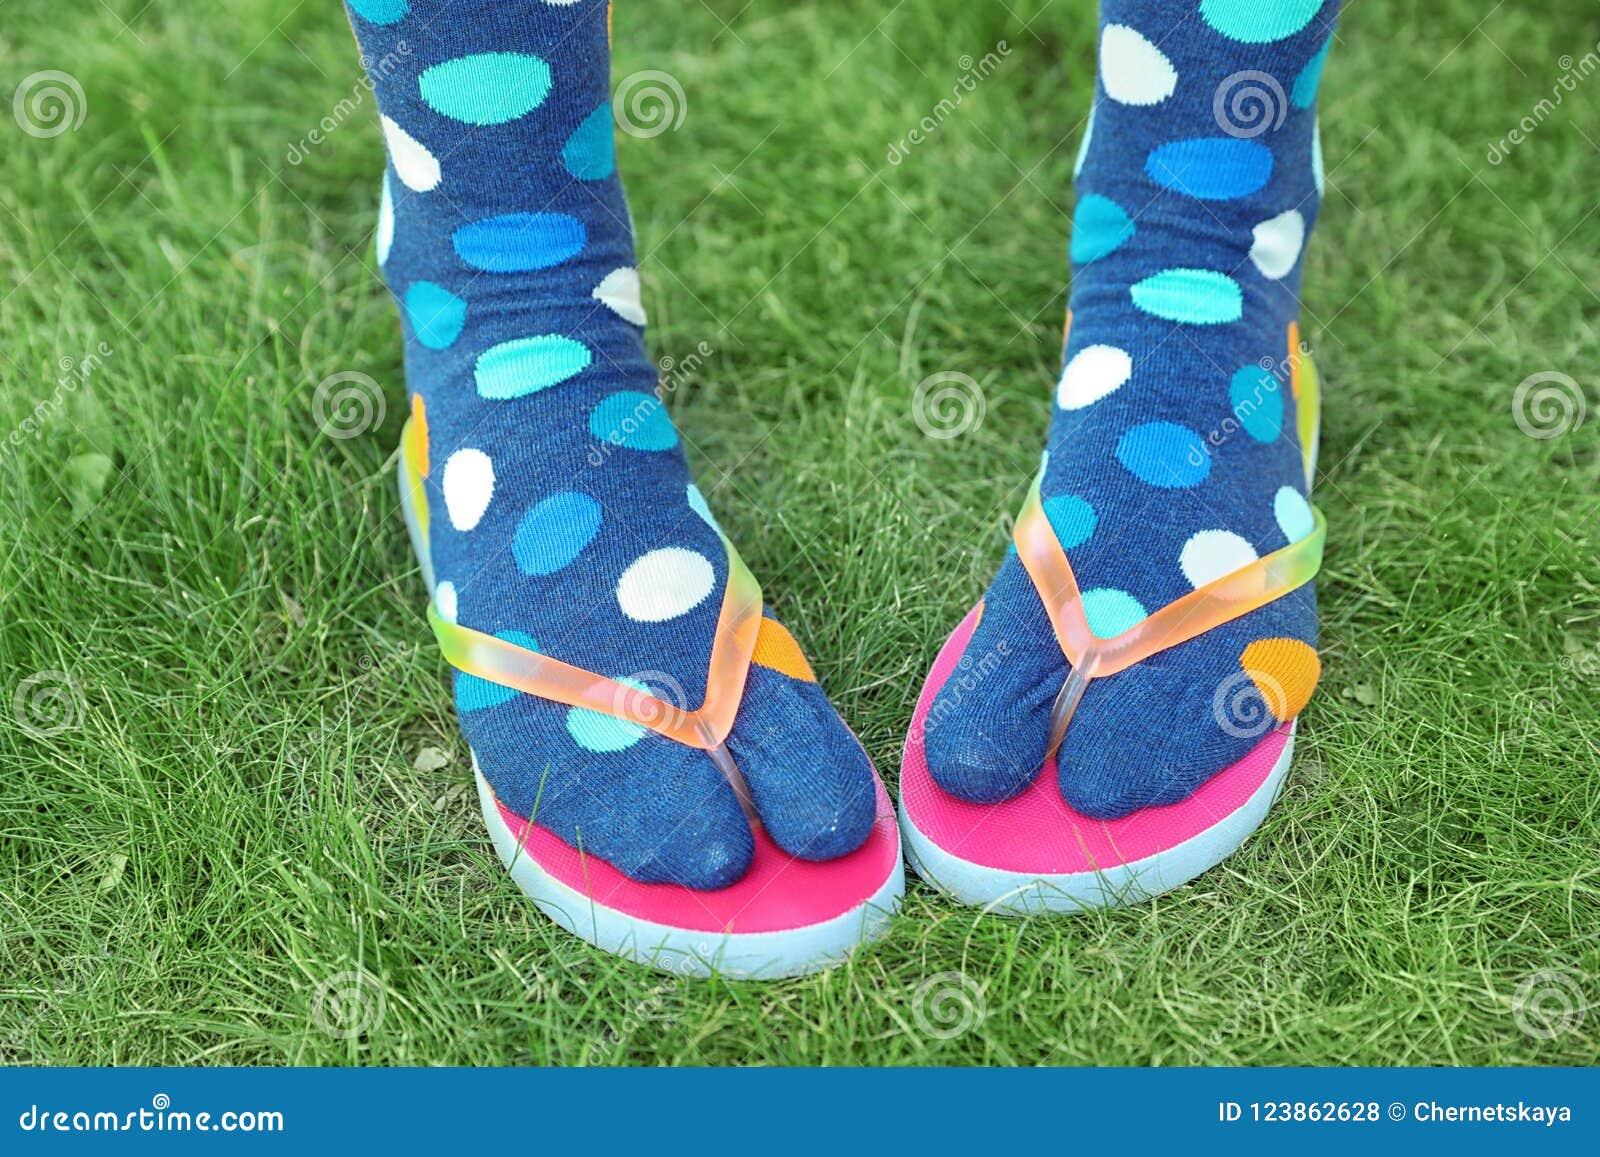 Woman wearing bright socks with flip-flops standing